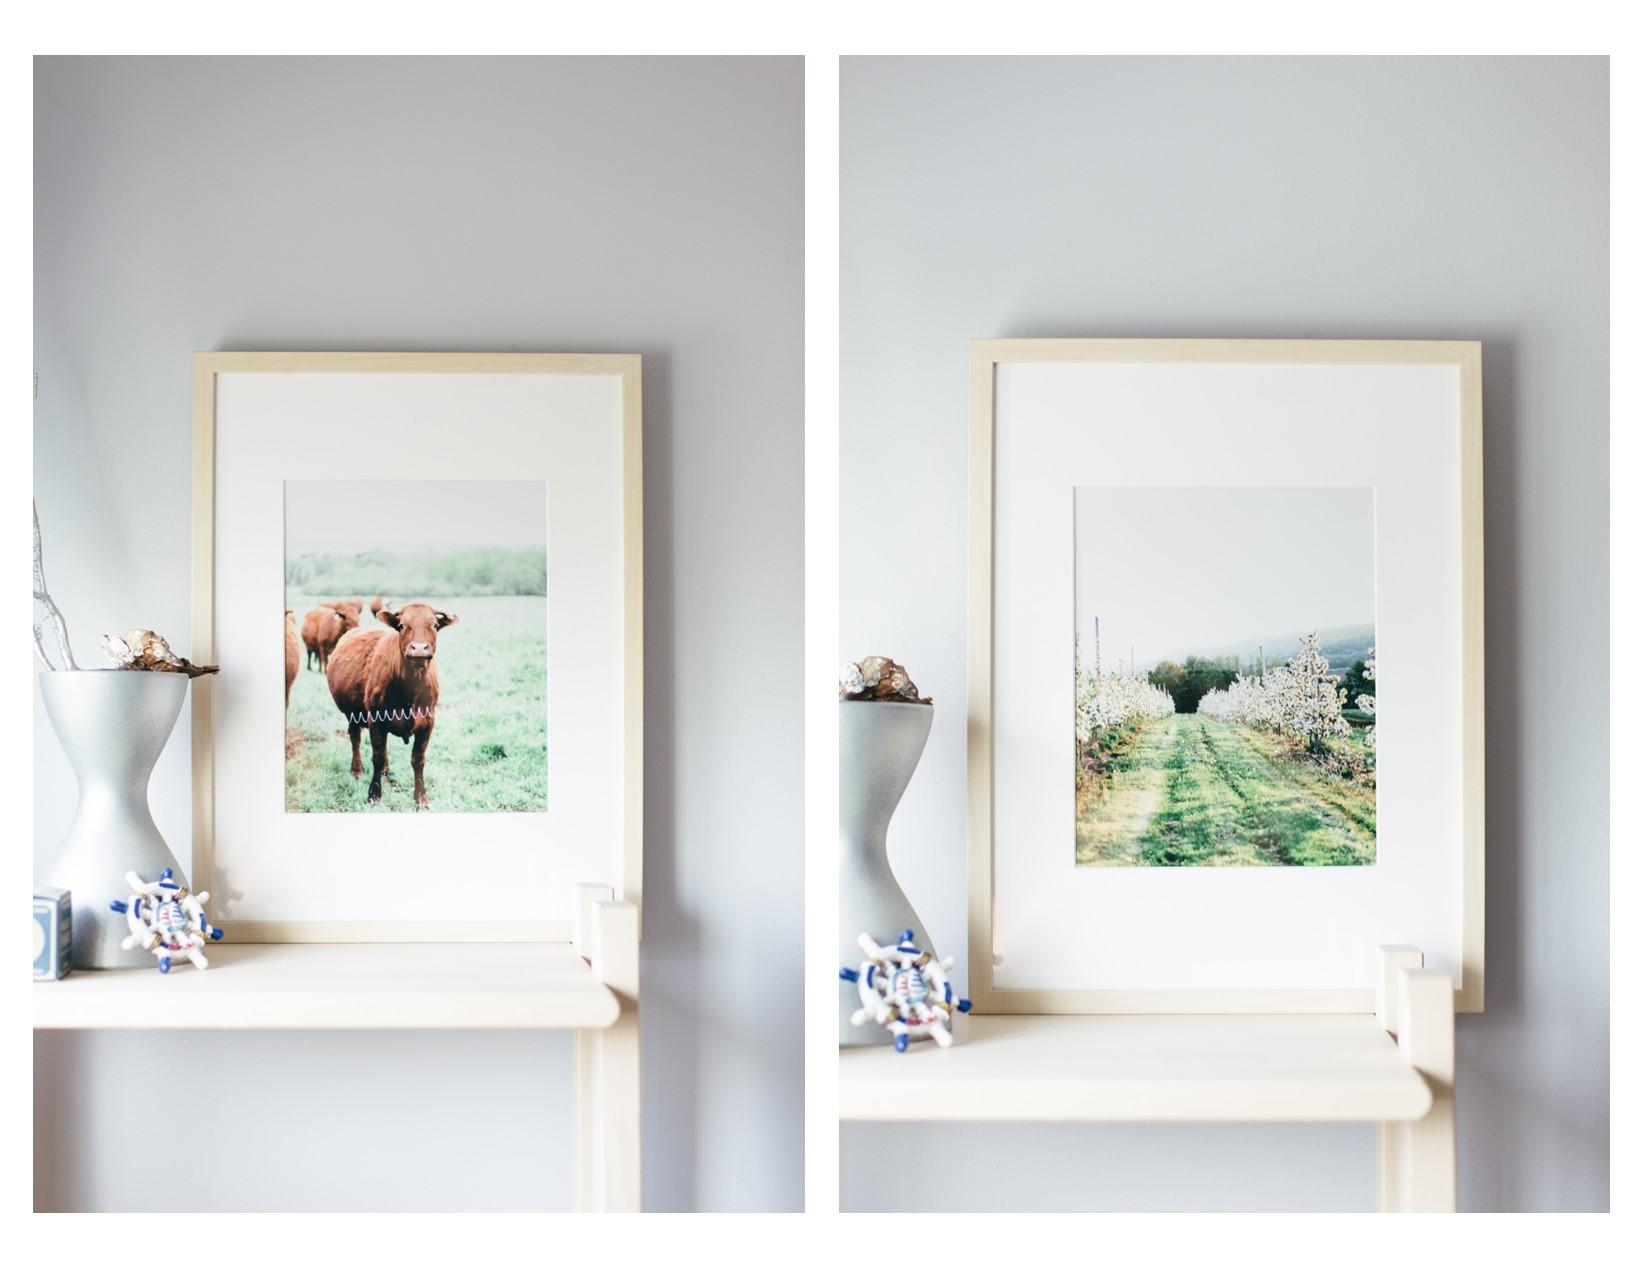 Blomidon, Canning, Annapolis Valley Nova Scotia Apple Blossoms, prints, frames